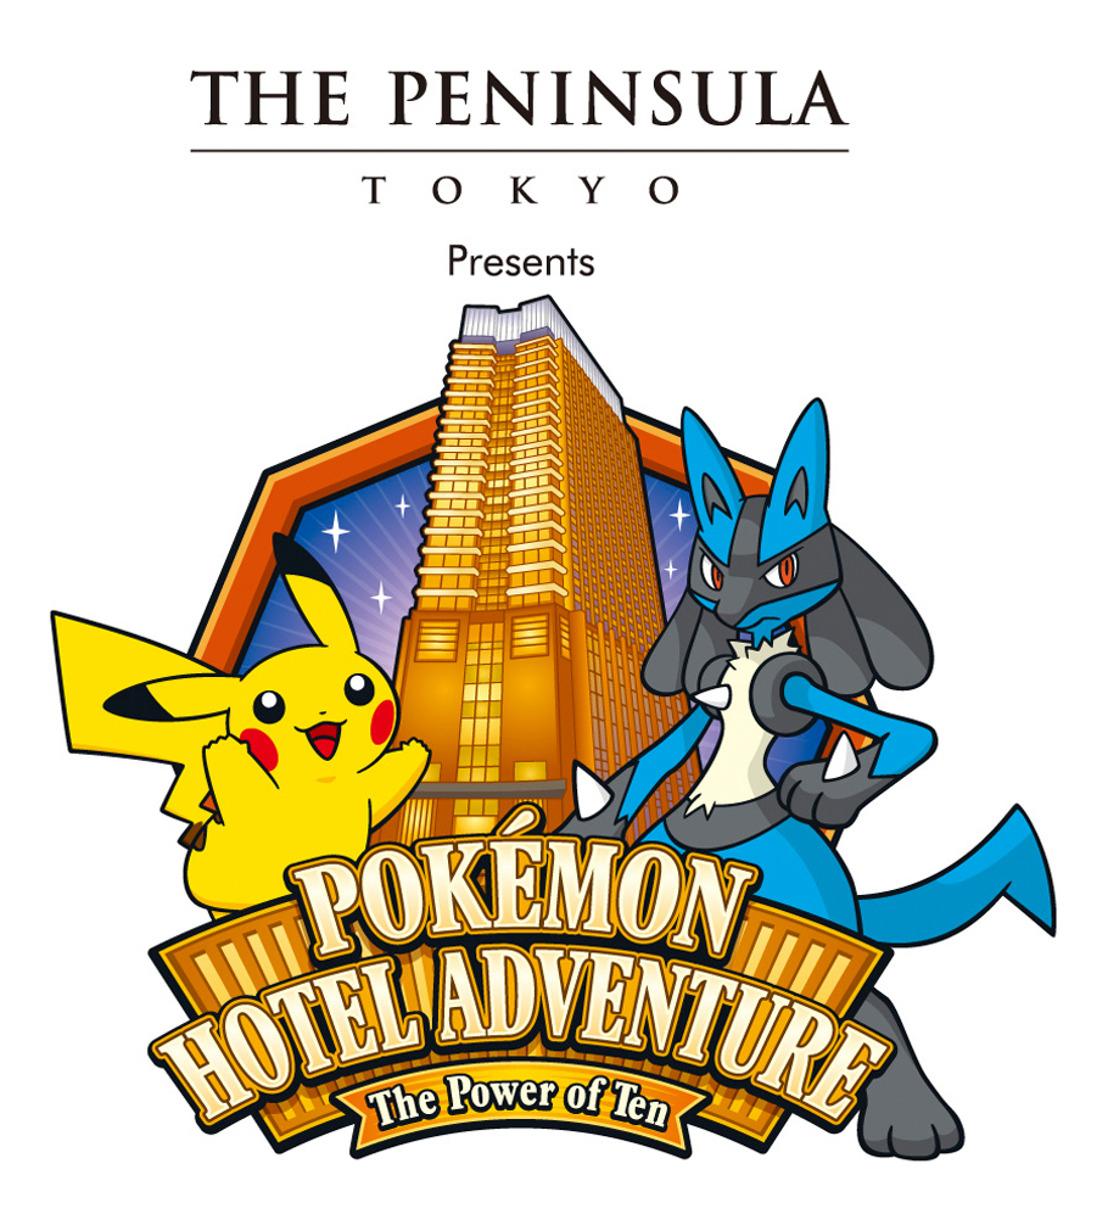 "THE PENINSULA TOKYO PRESENTA ""THE POKÉMON HOTEL ADVENTURE: THE POWER OF TEN"""